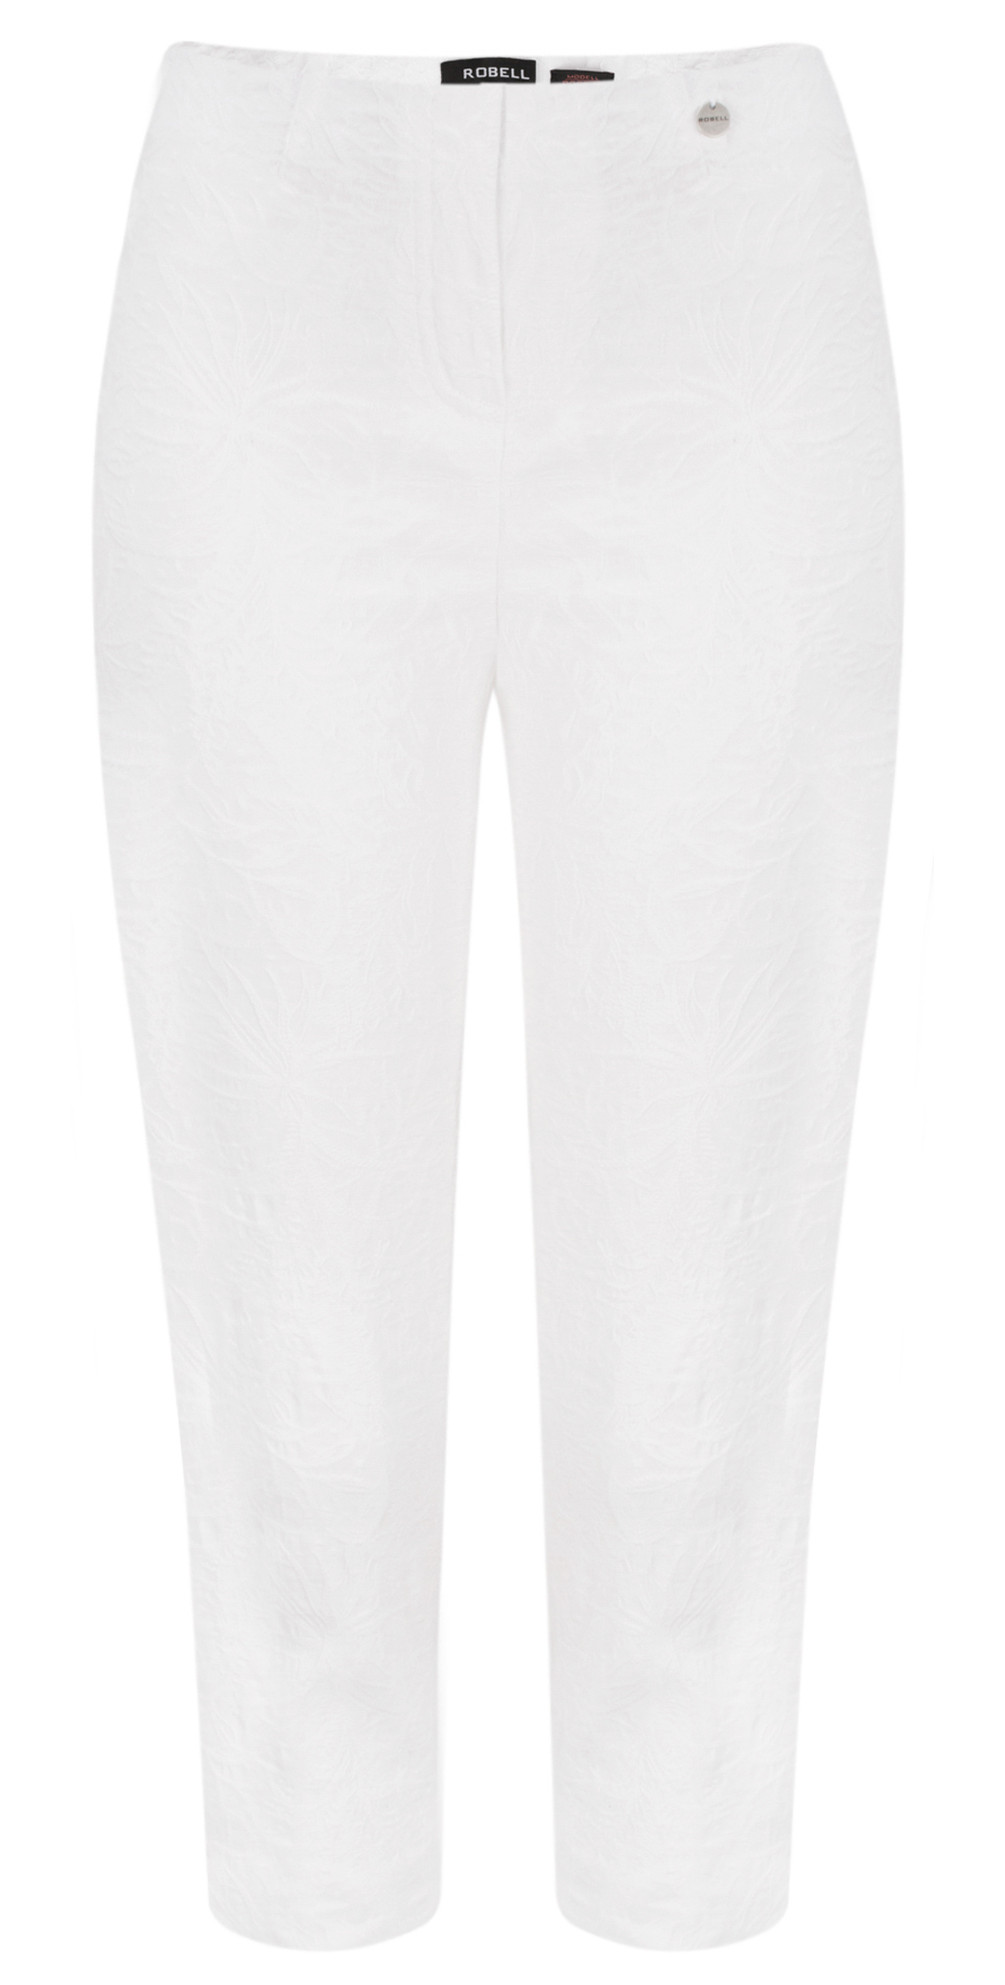 Marie 07 White Jacquard Crop Trouser main image